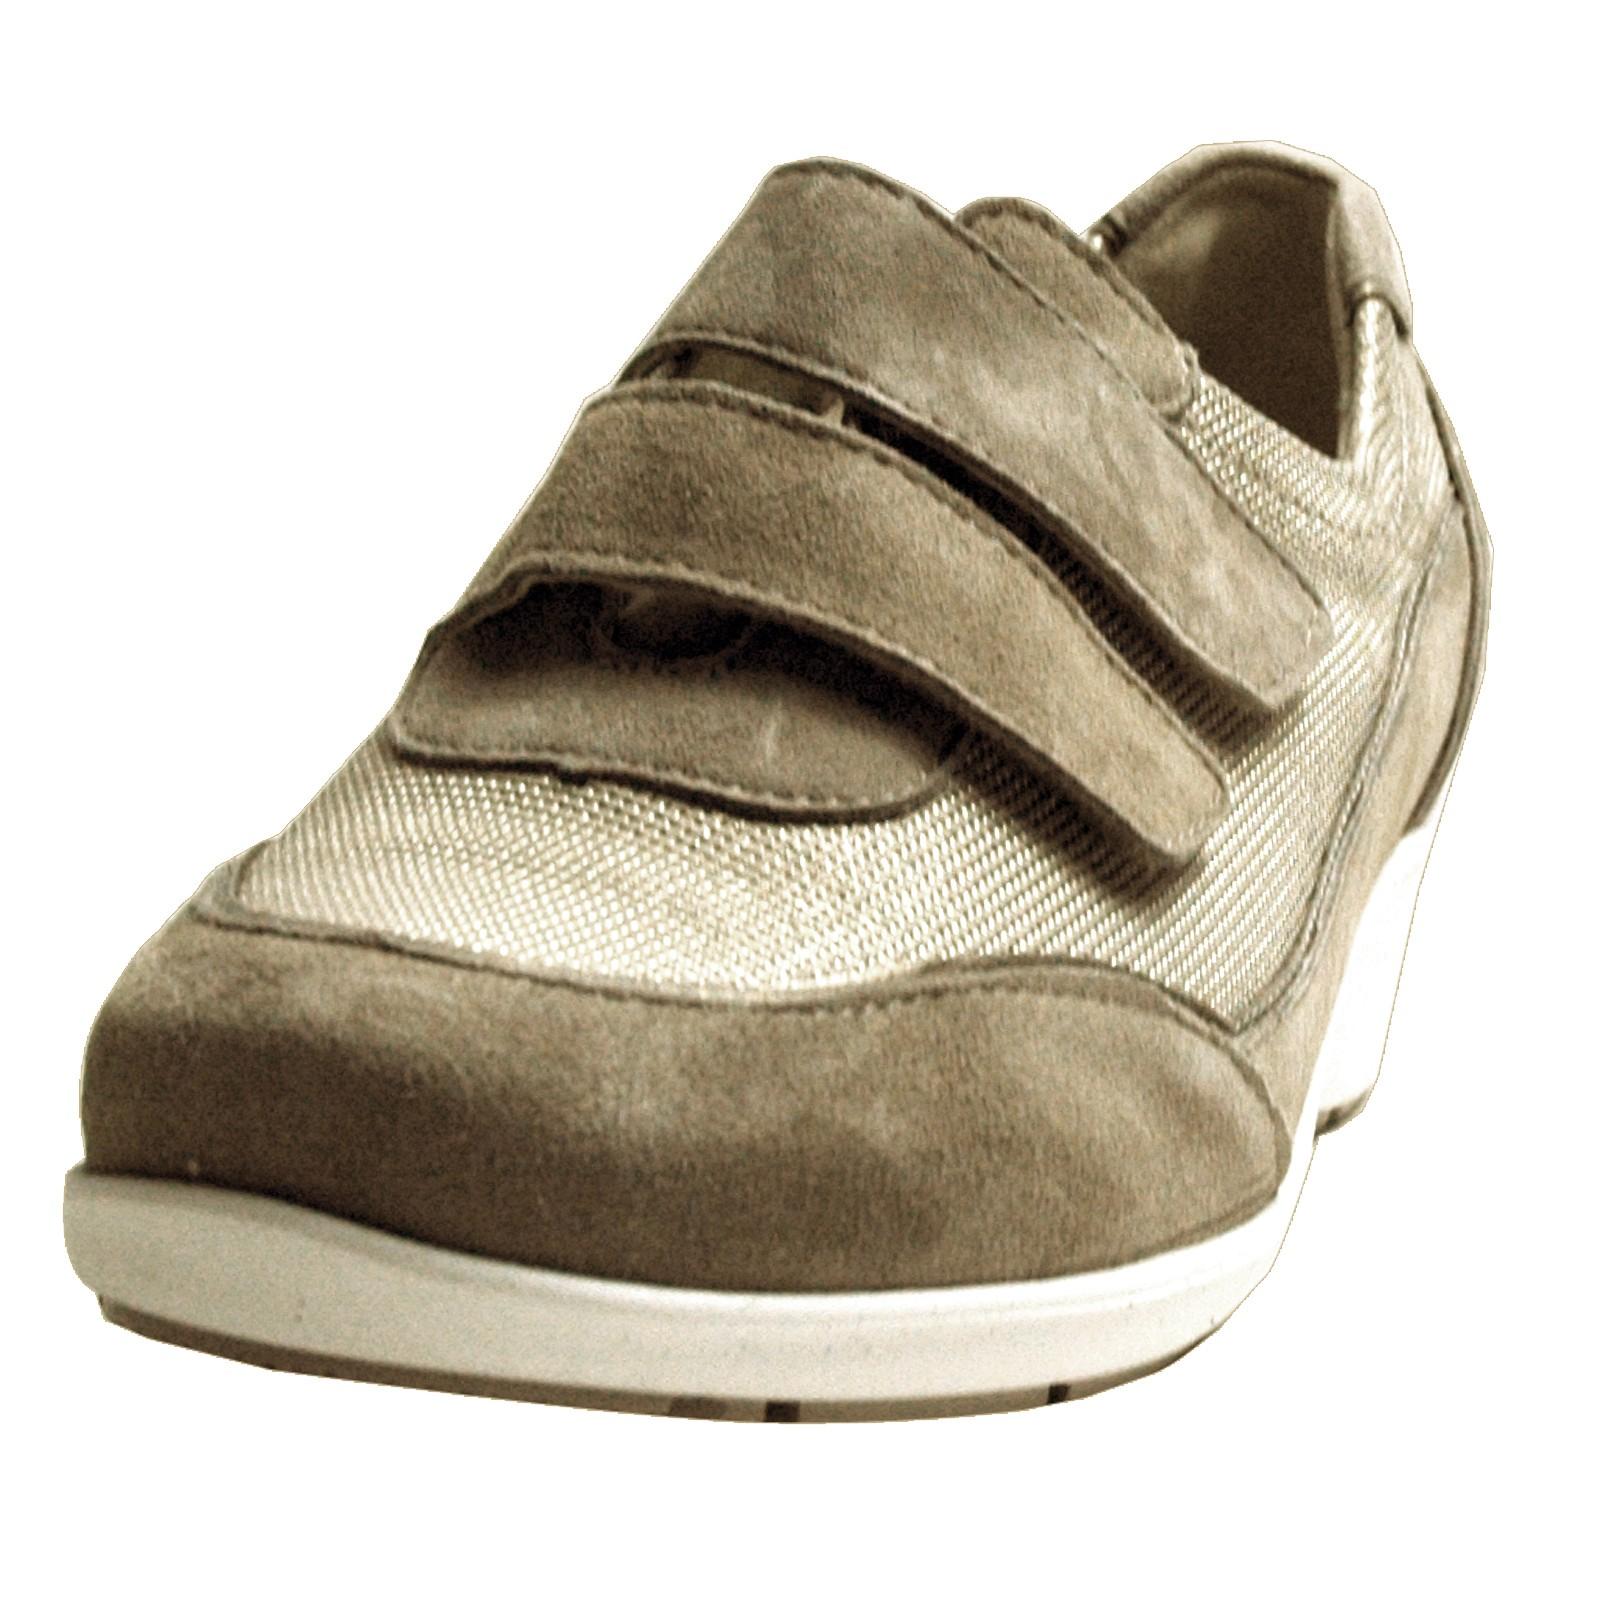 Waldläufer Damen Sneakers Kina, corda lightgold, Weite K